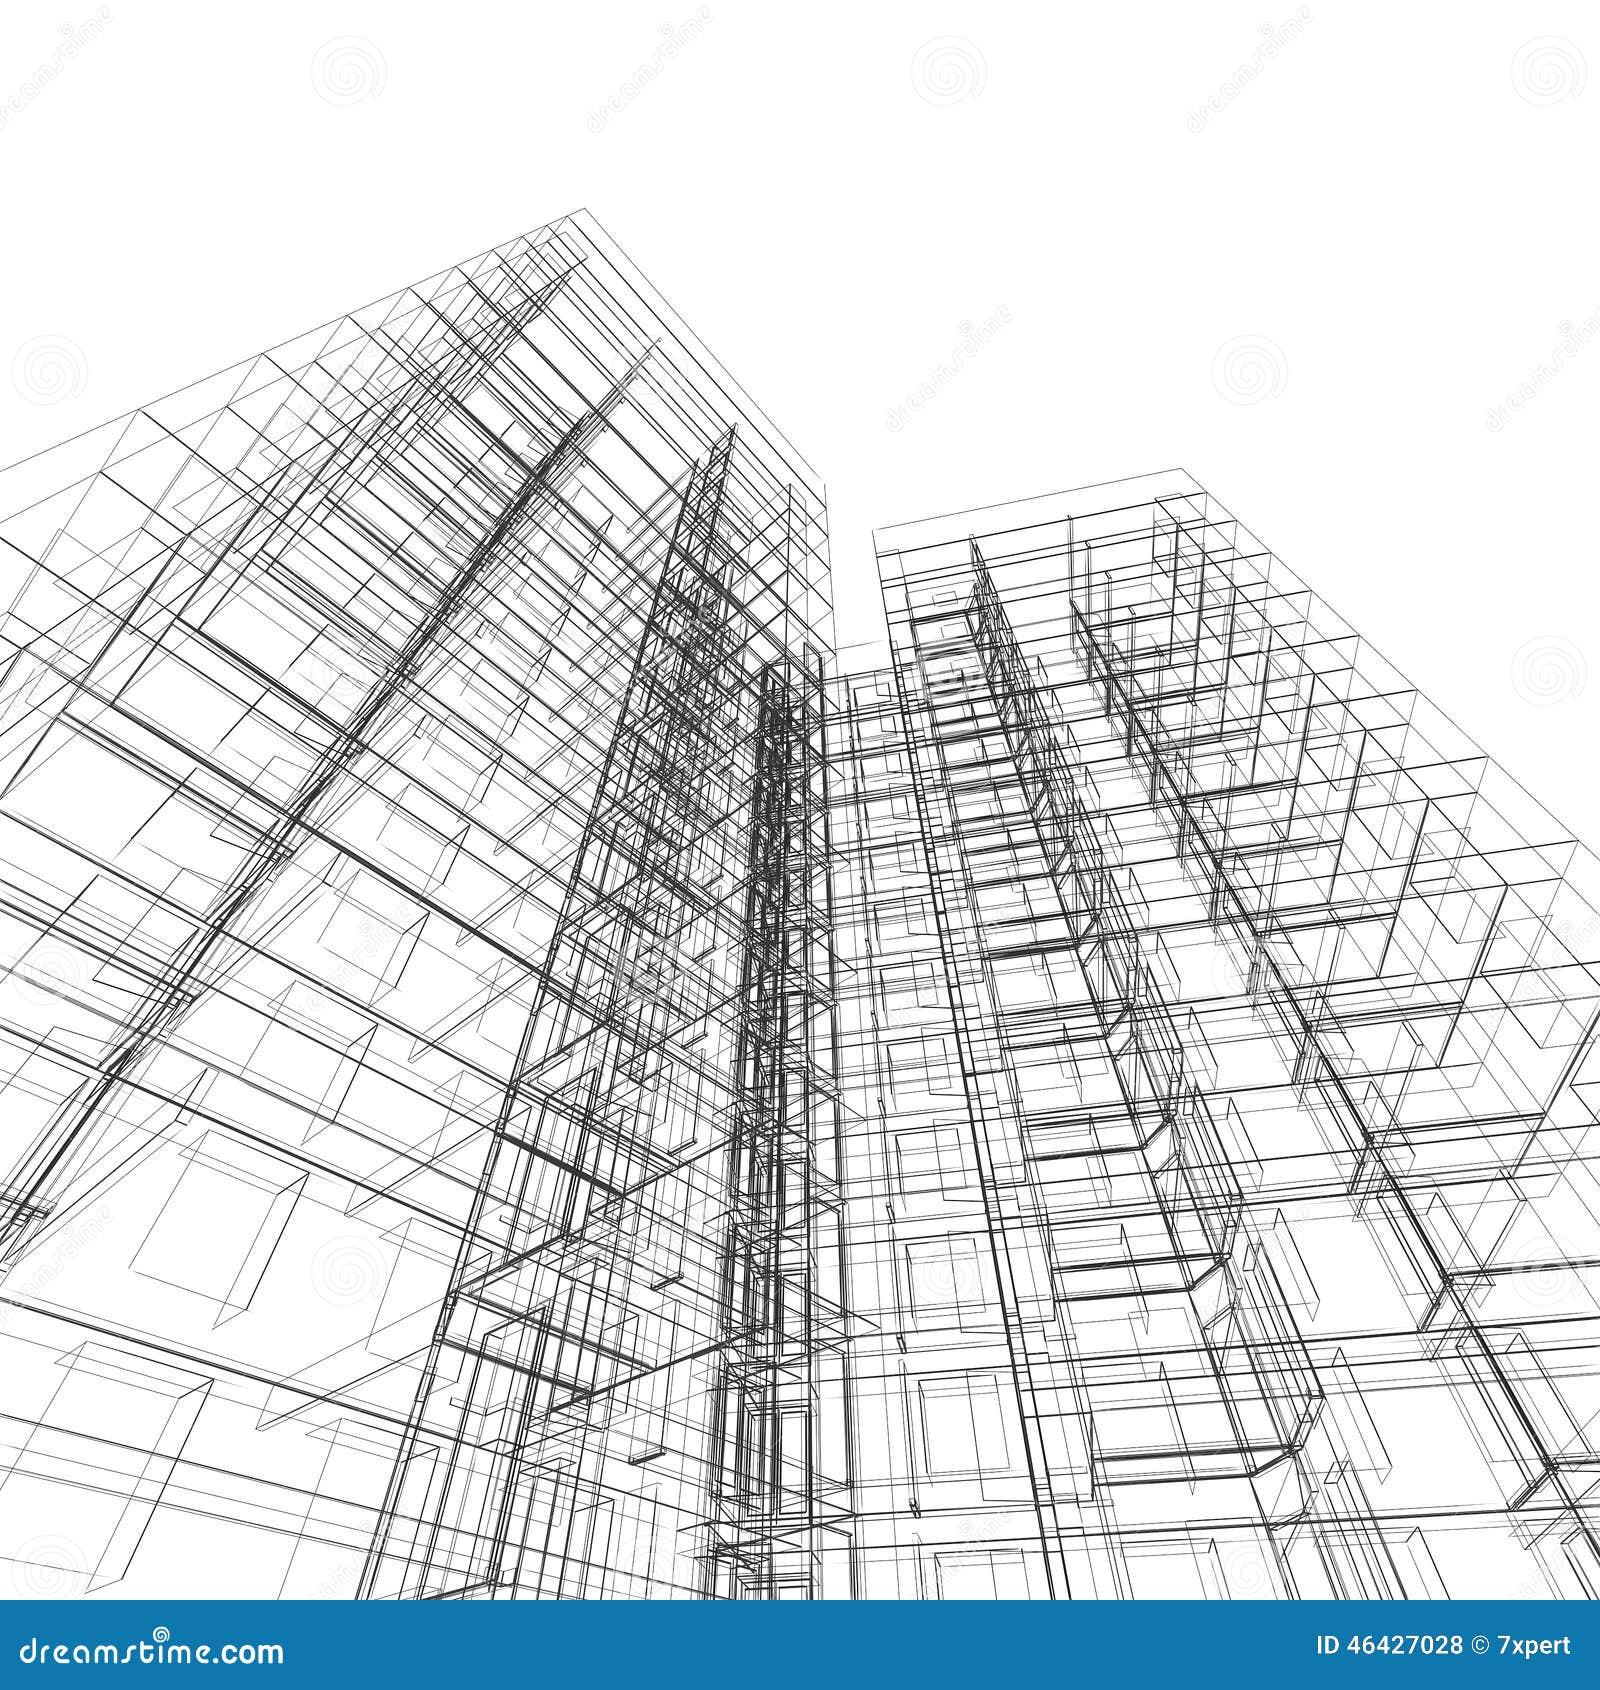 Arquitectura de la construcci n stock de ilustraci n for Paginas de construccion y arquitectura